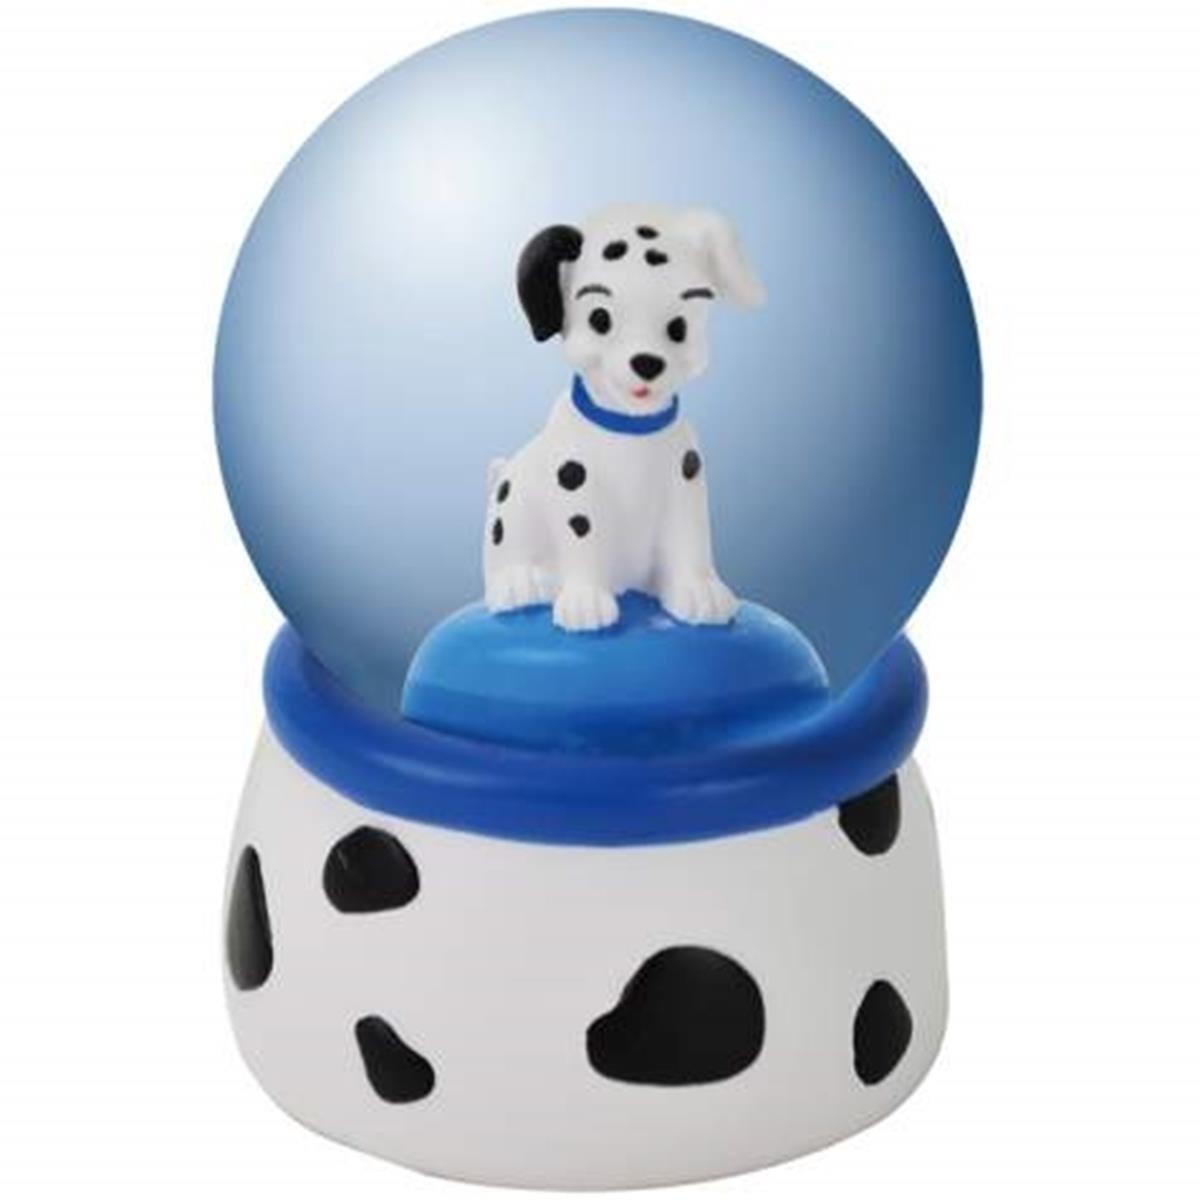 WL SS-WL-22851 45mm Dalmatian Puppy Looking Forward with Blue Collar Water Globe